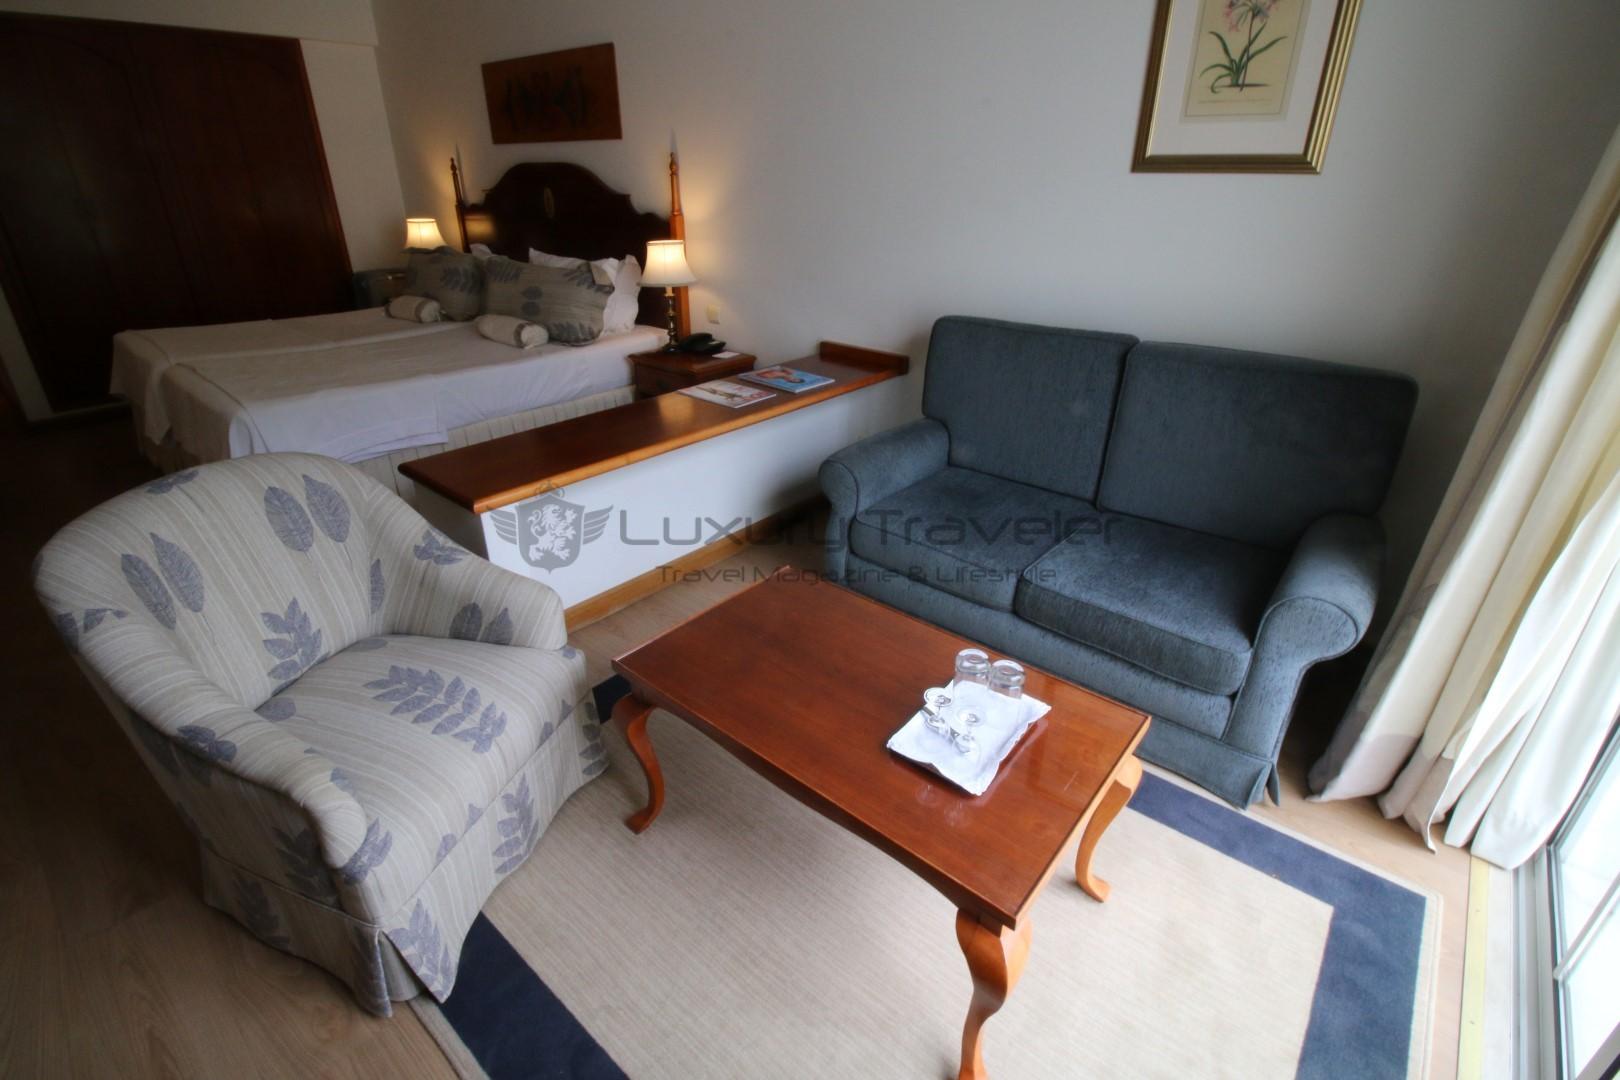 quintinha_sao_joao_funchal_madeira_hotels